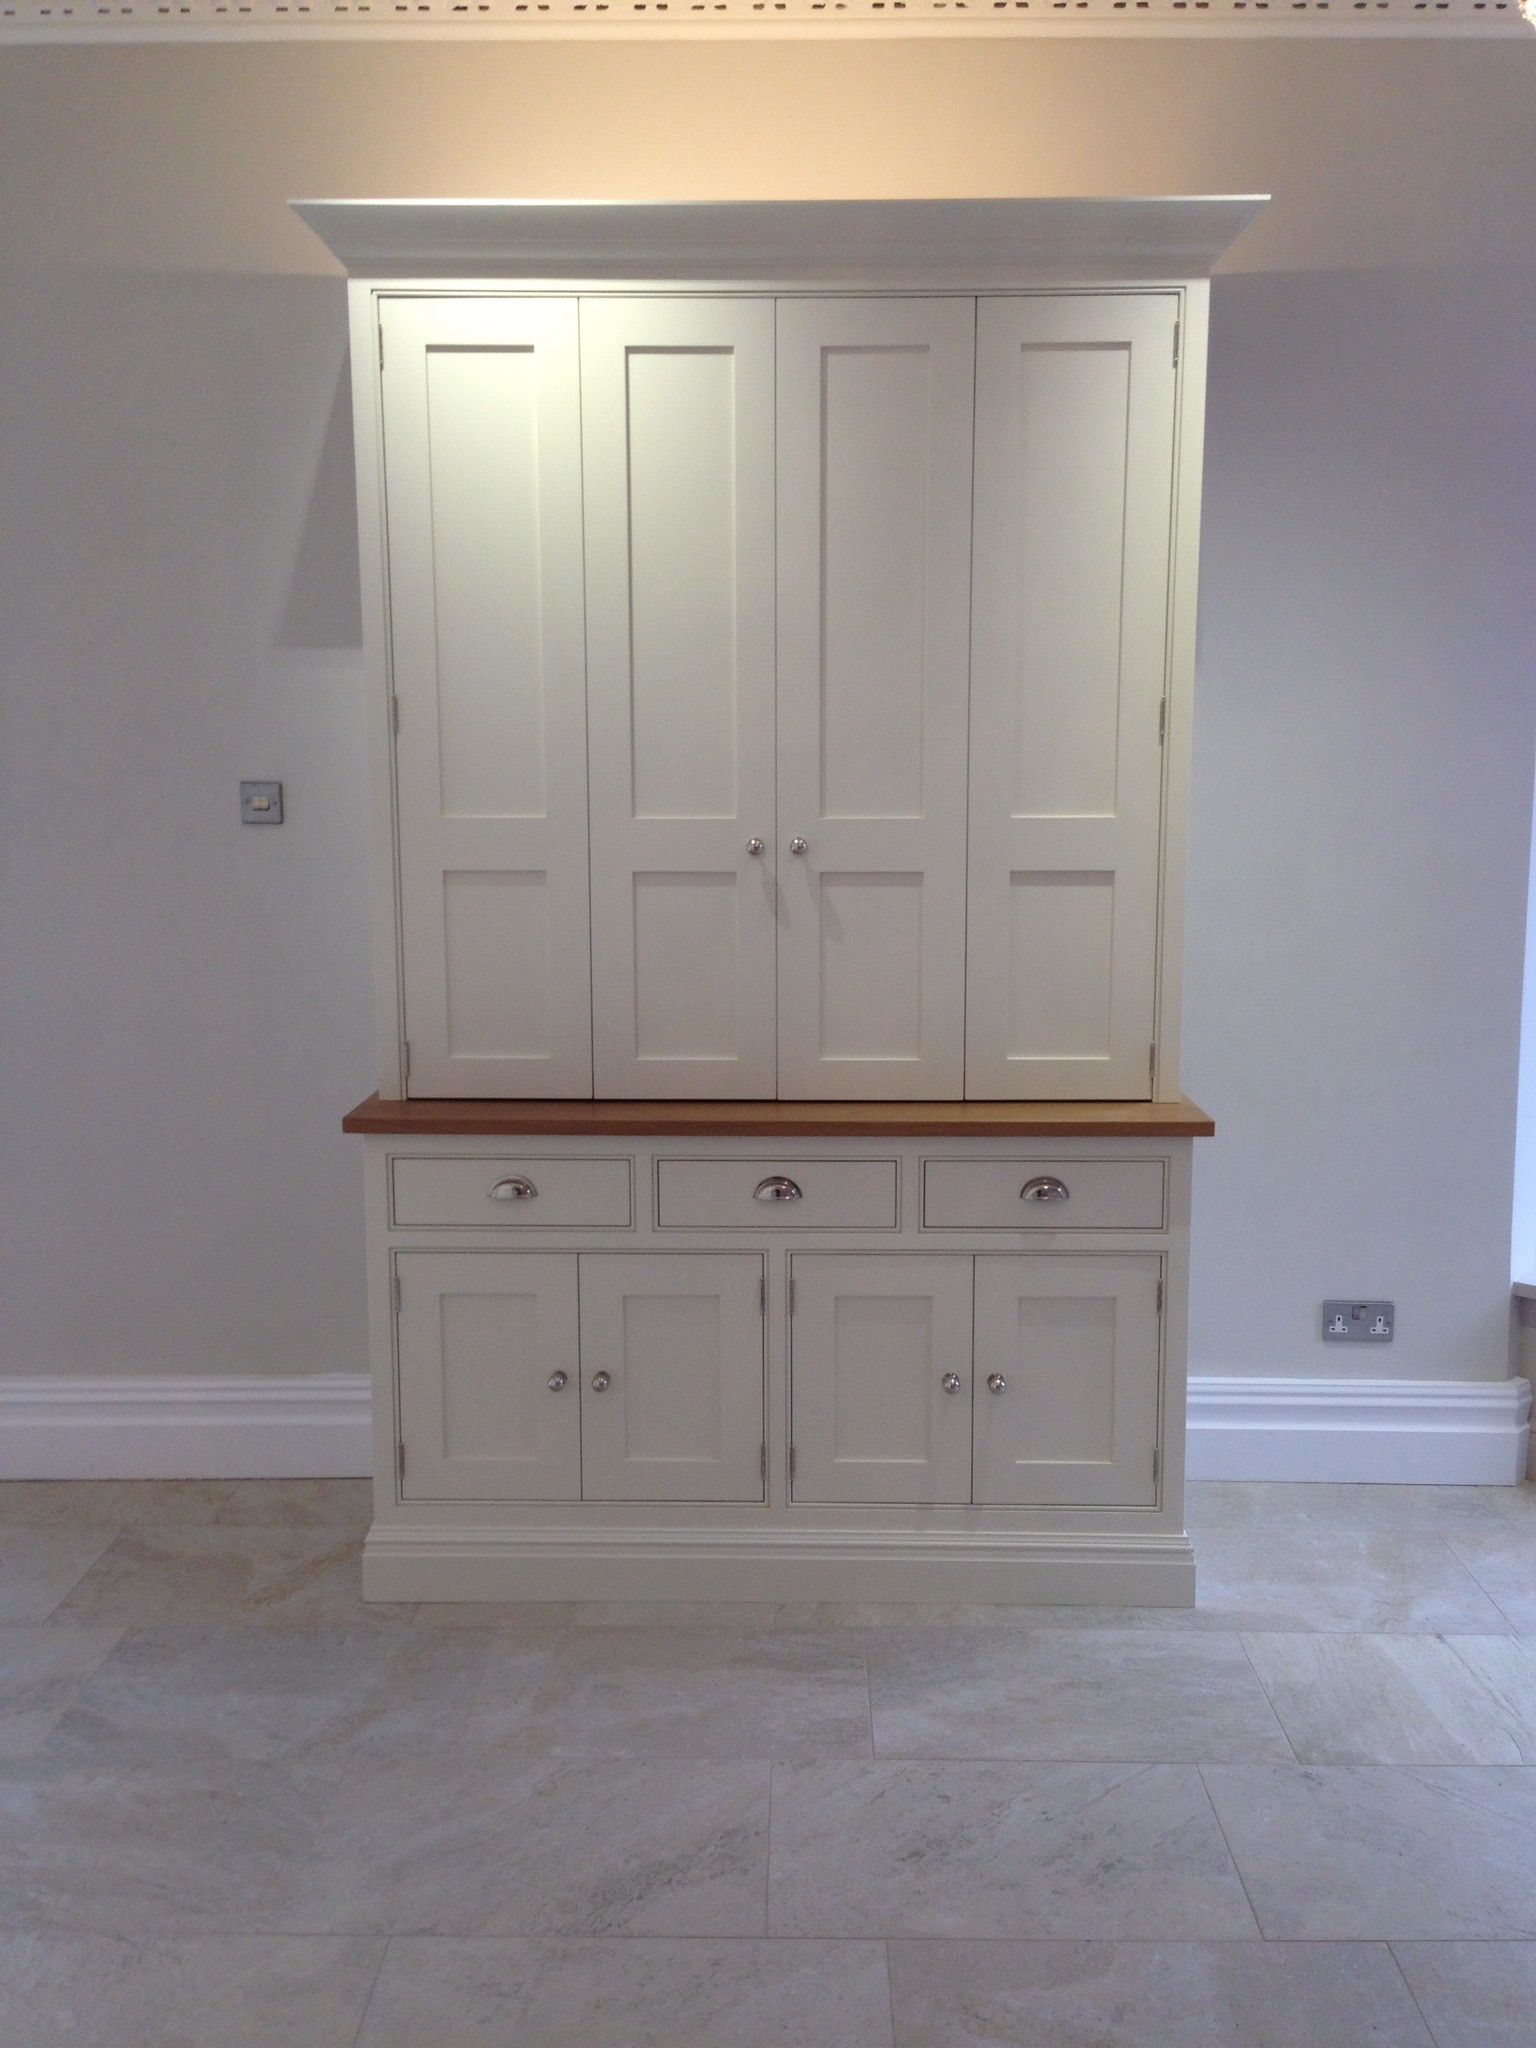 White Kitchen Dresser Unit Tom Howley Furniture Dresser Unit With Bi Fold Doors Kitchen